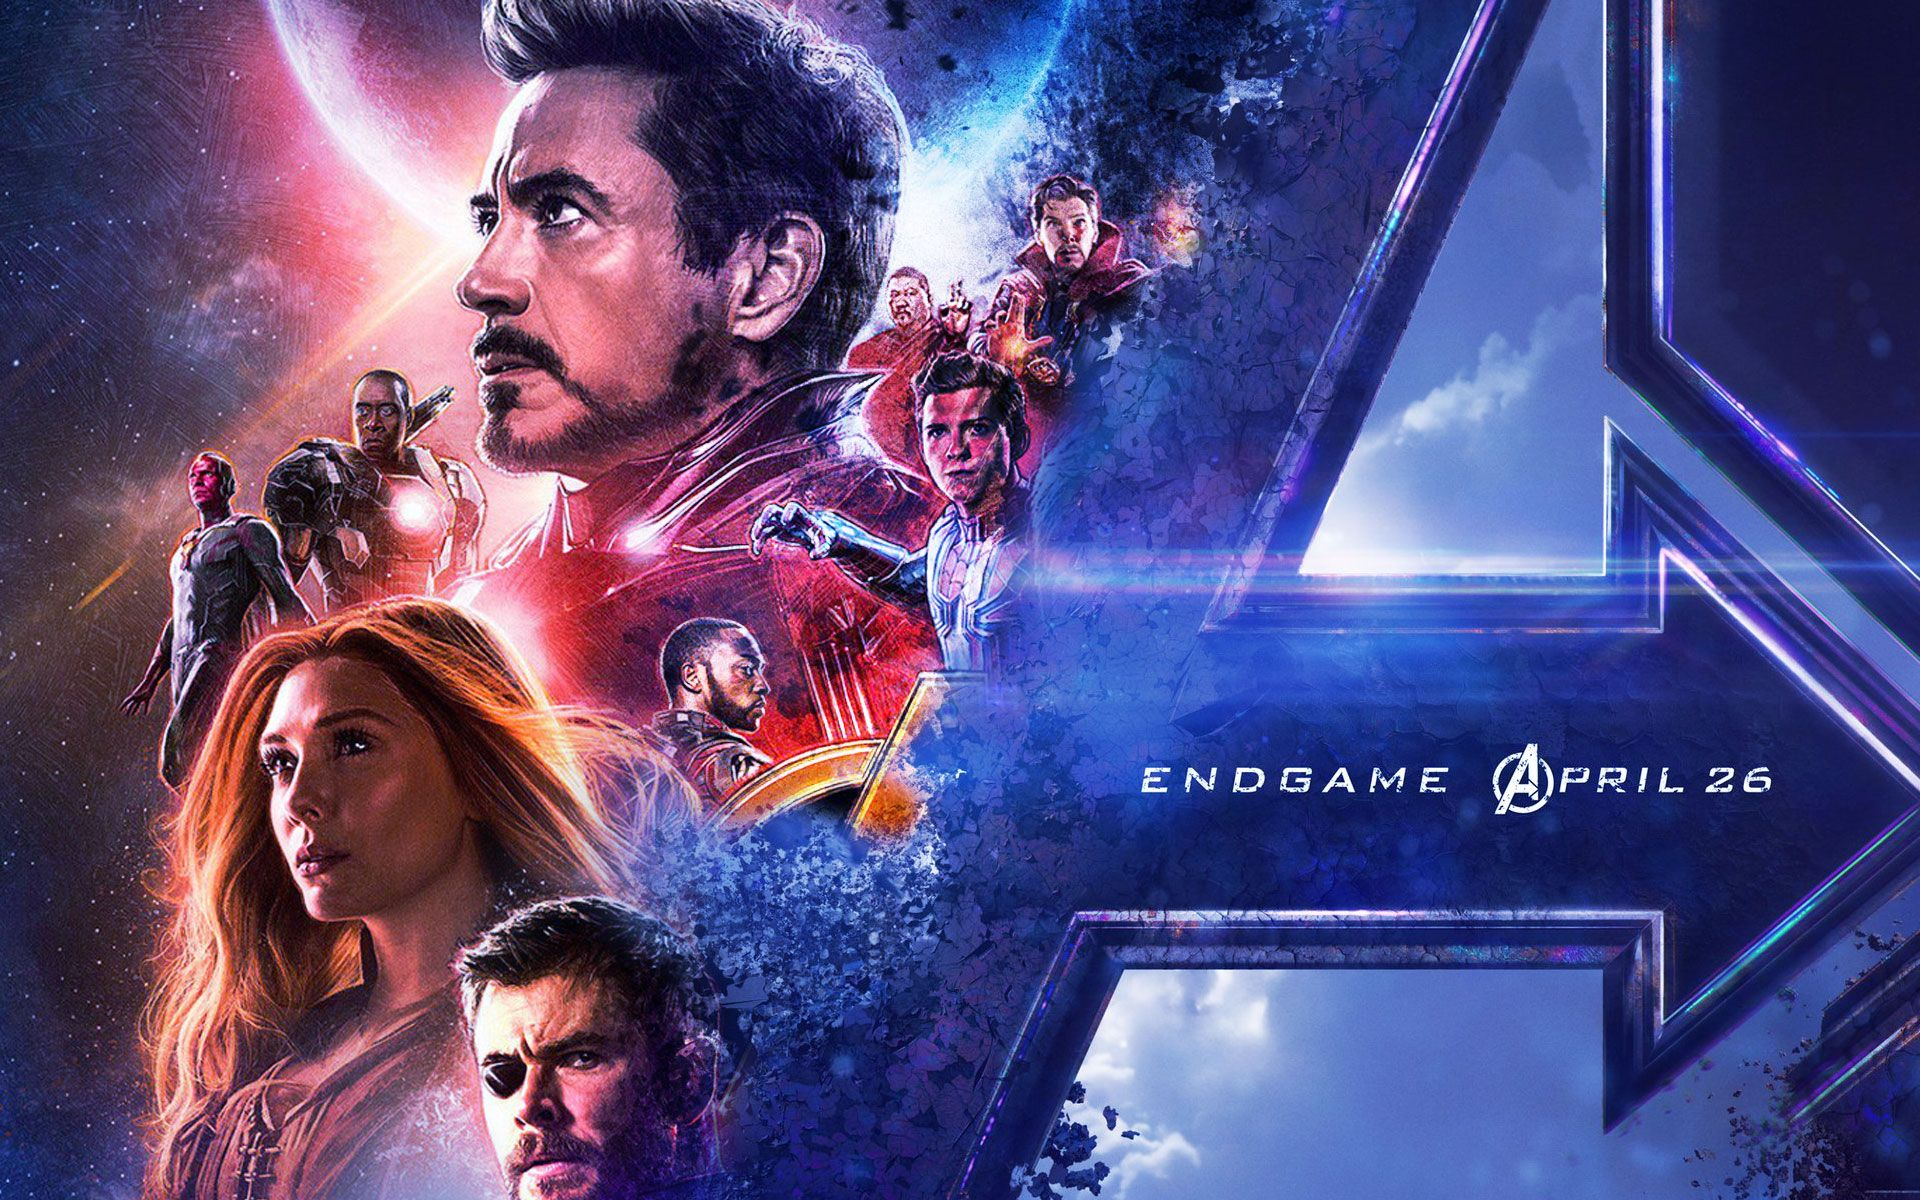 Avengers Endgame 2019 Desktop Wallpapers Hd Avengers Endgame Wallpapers Desktop Backgrounds Poster Marvel Films Designbolts Windows Resolution End Game Di 2020